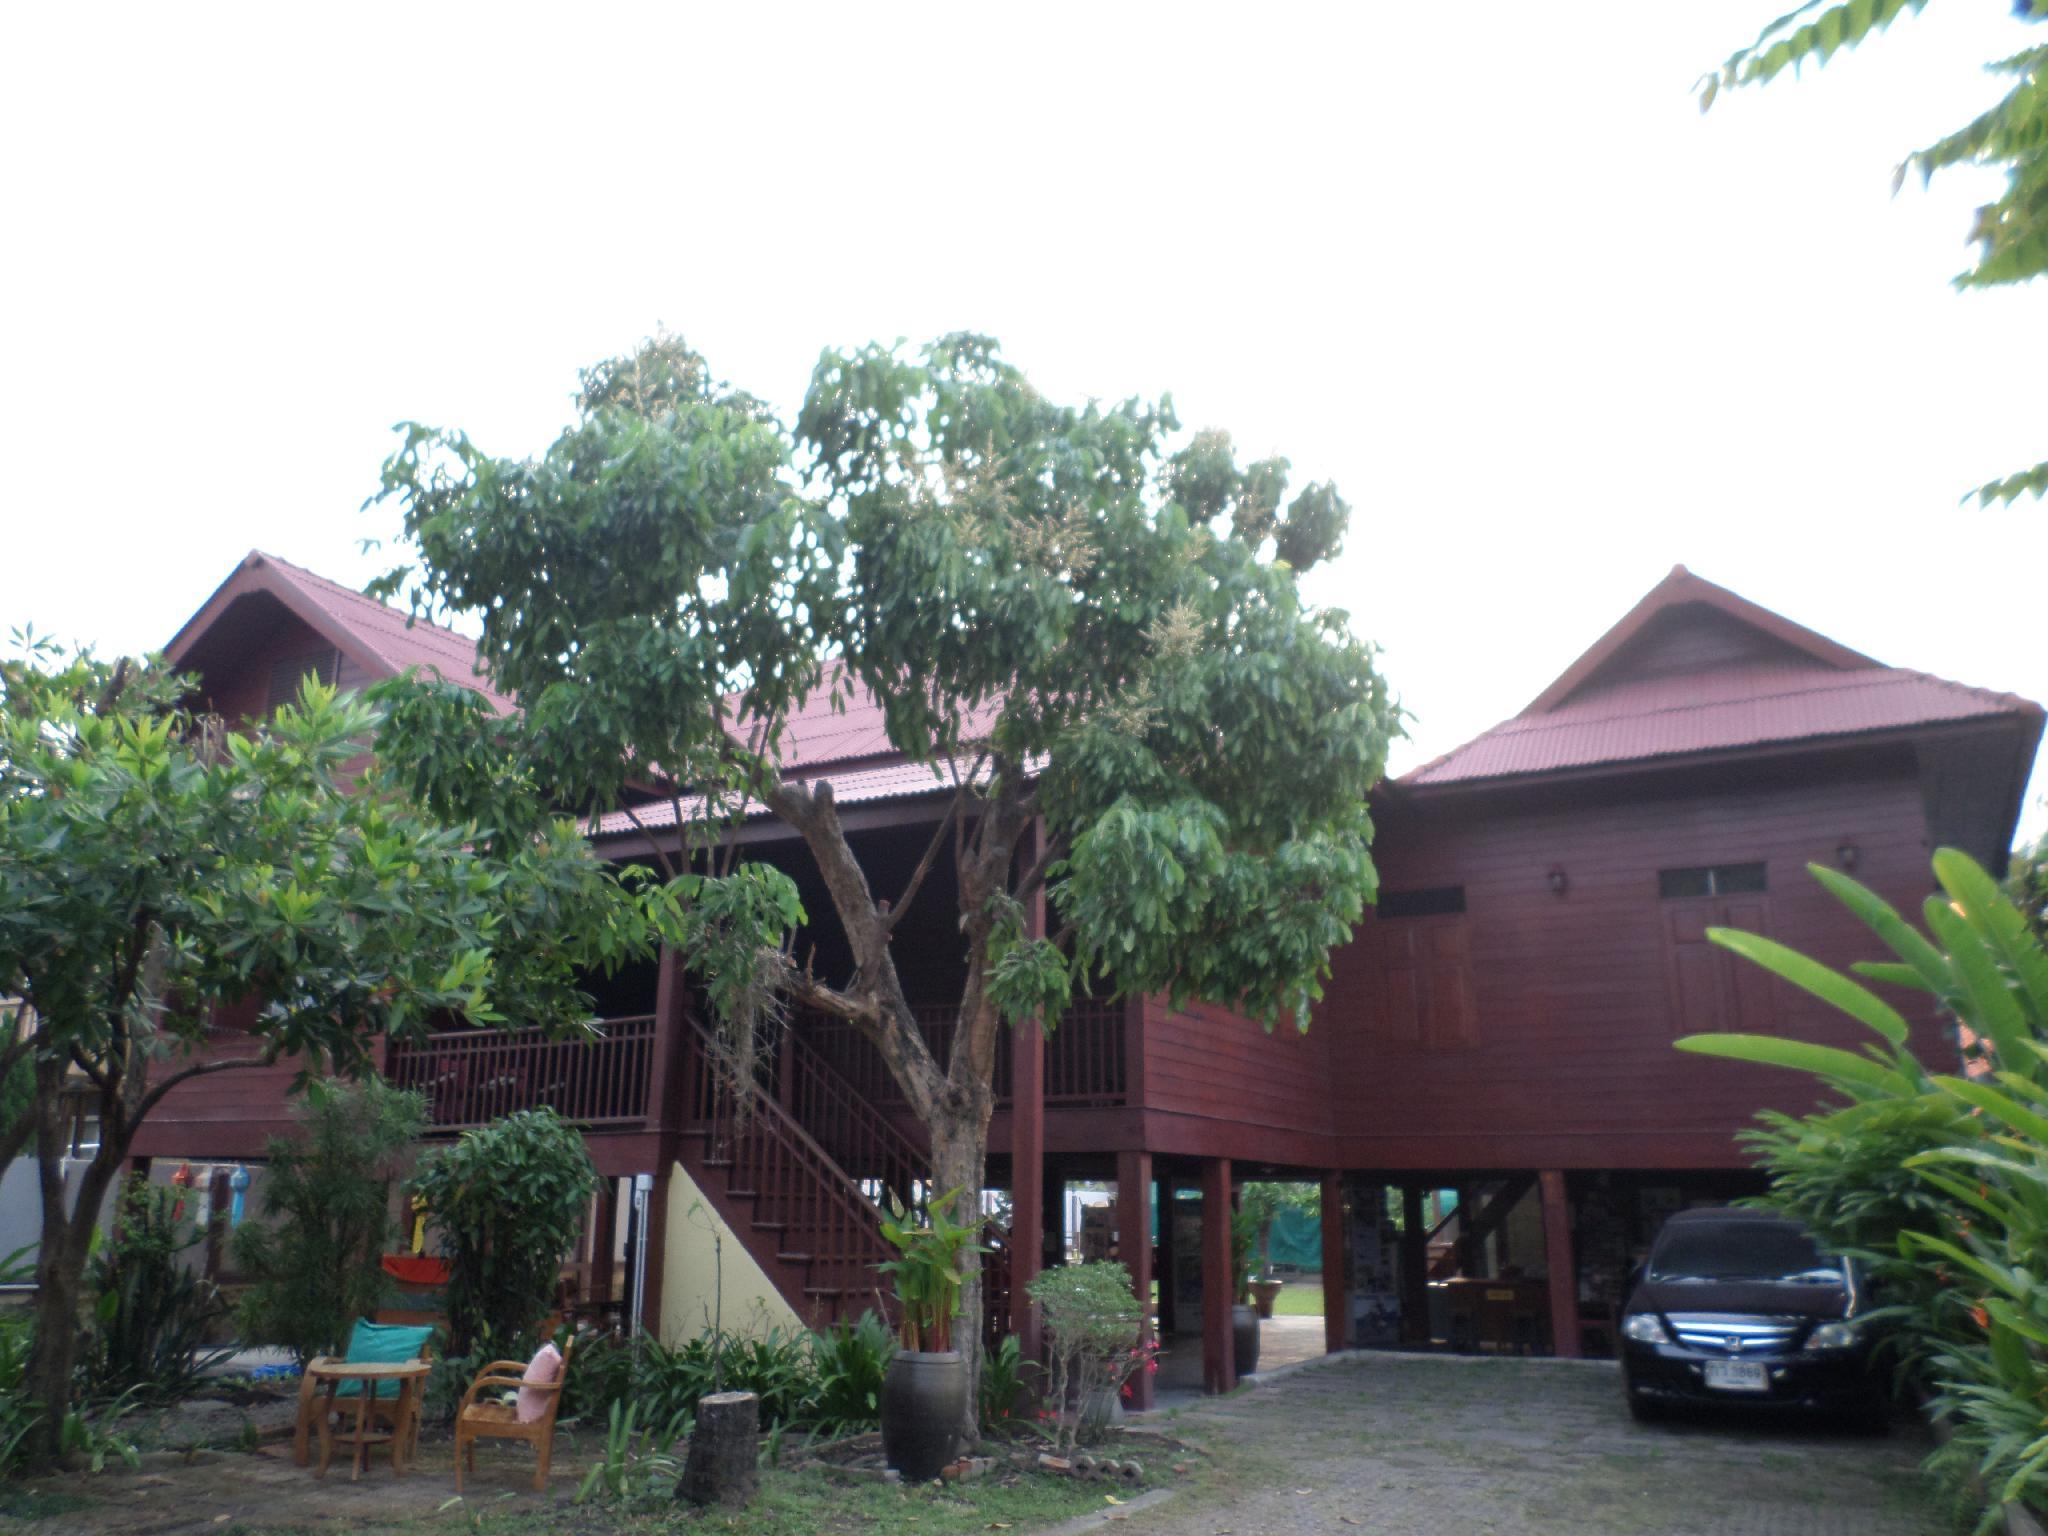 Baanwealaa Guesthouse,Baanwealaa Guesthouse